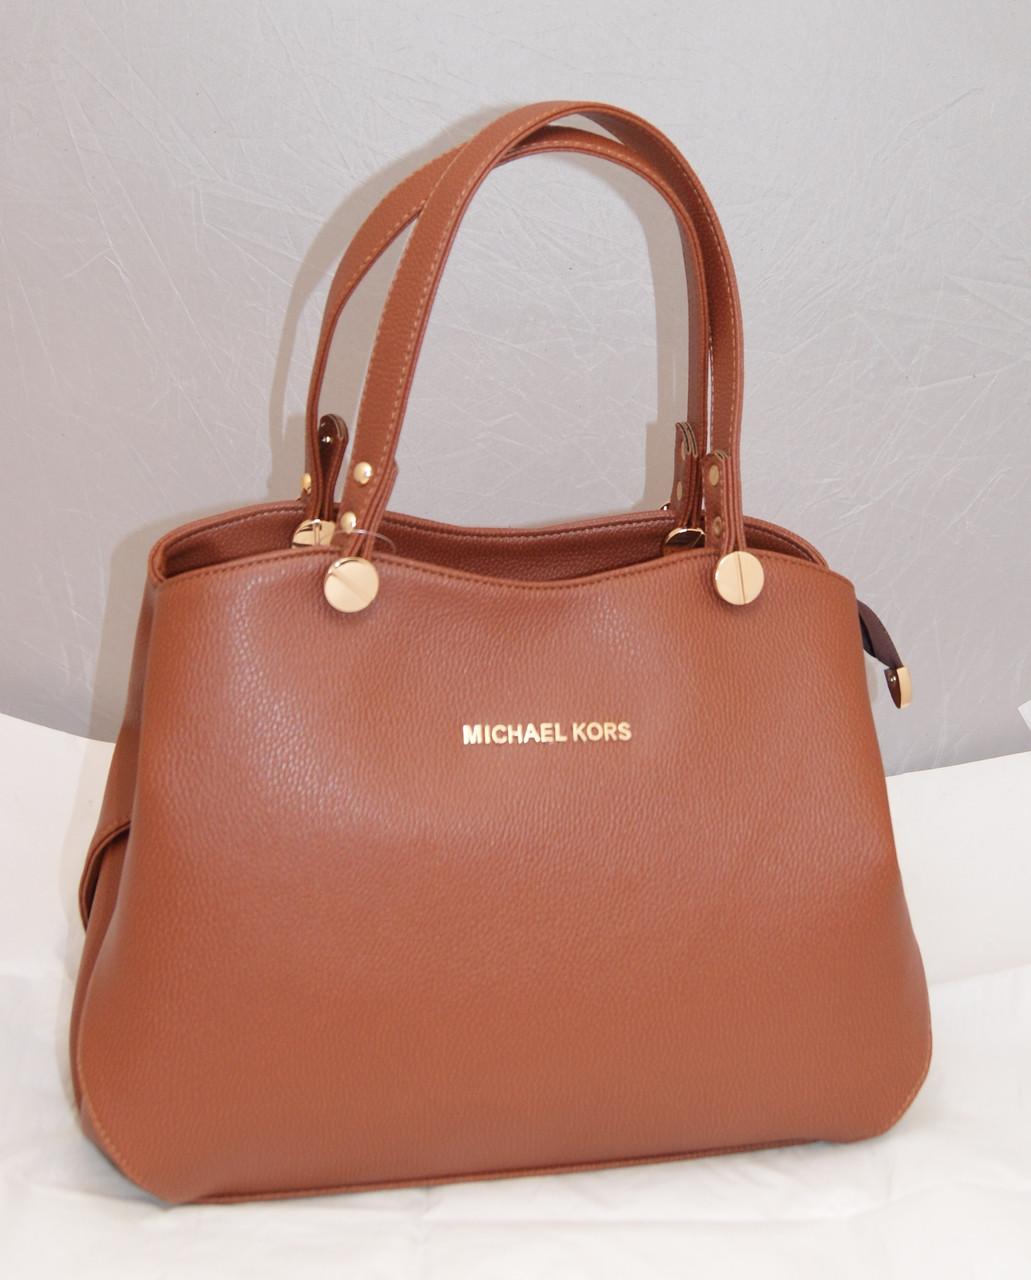 72a9359a7ff9 Женская сумка Michael Kors, цвет светло-коричневый Майкл Корс MK ...